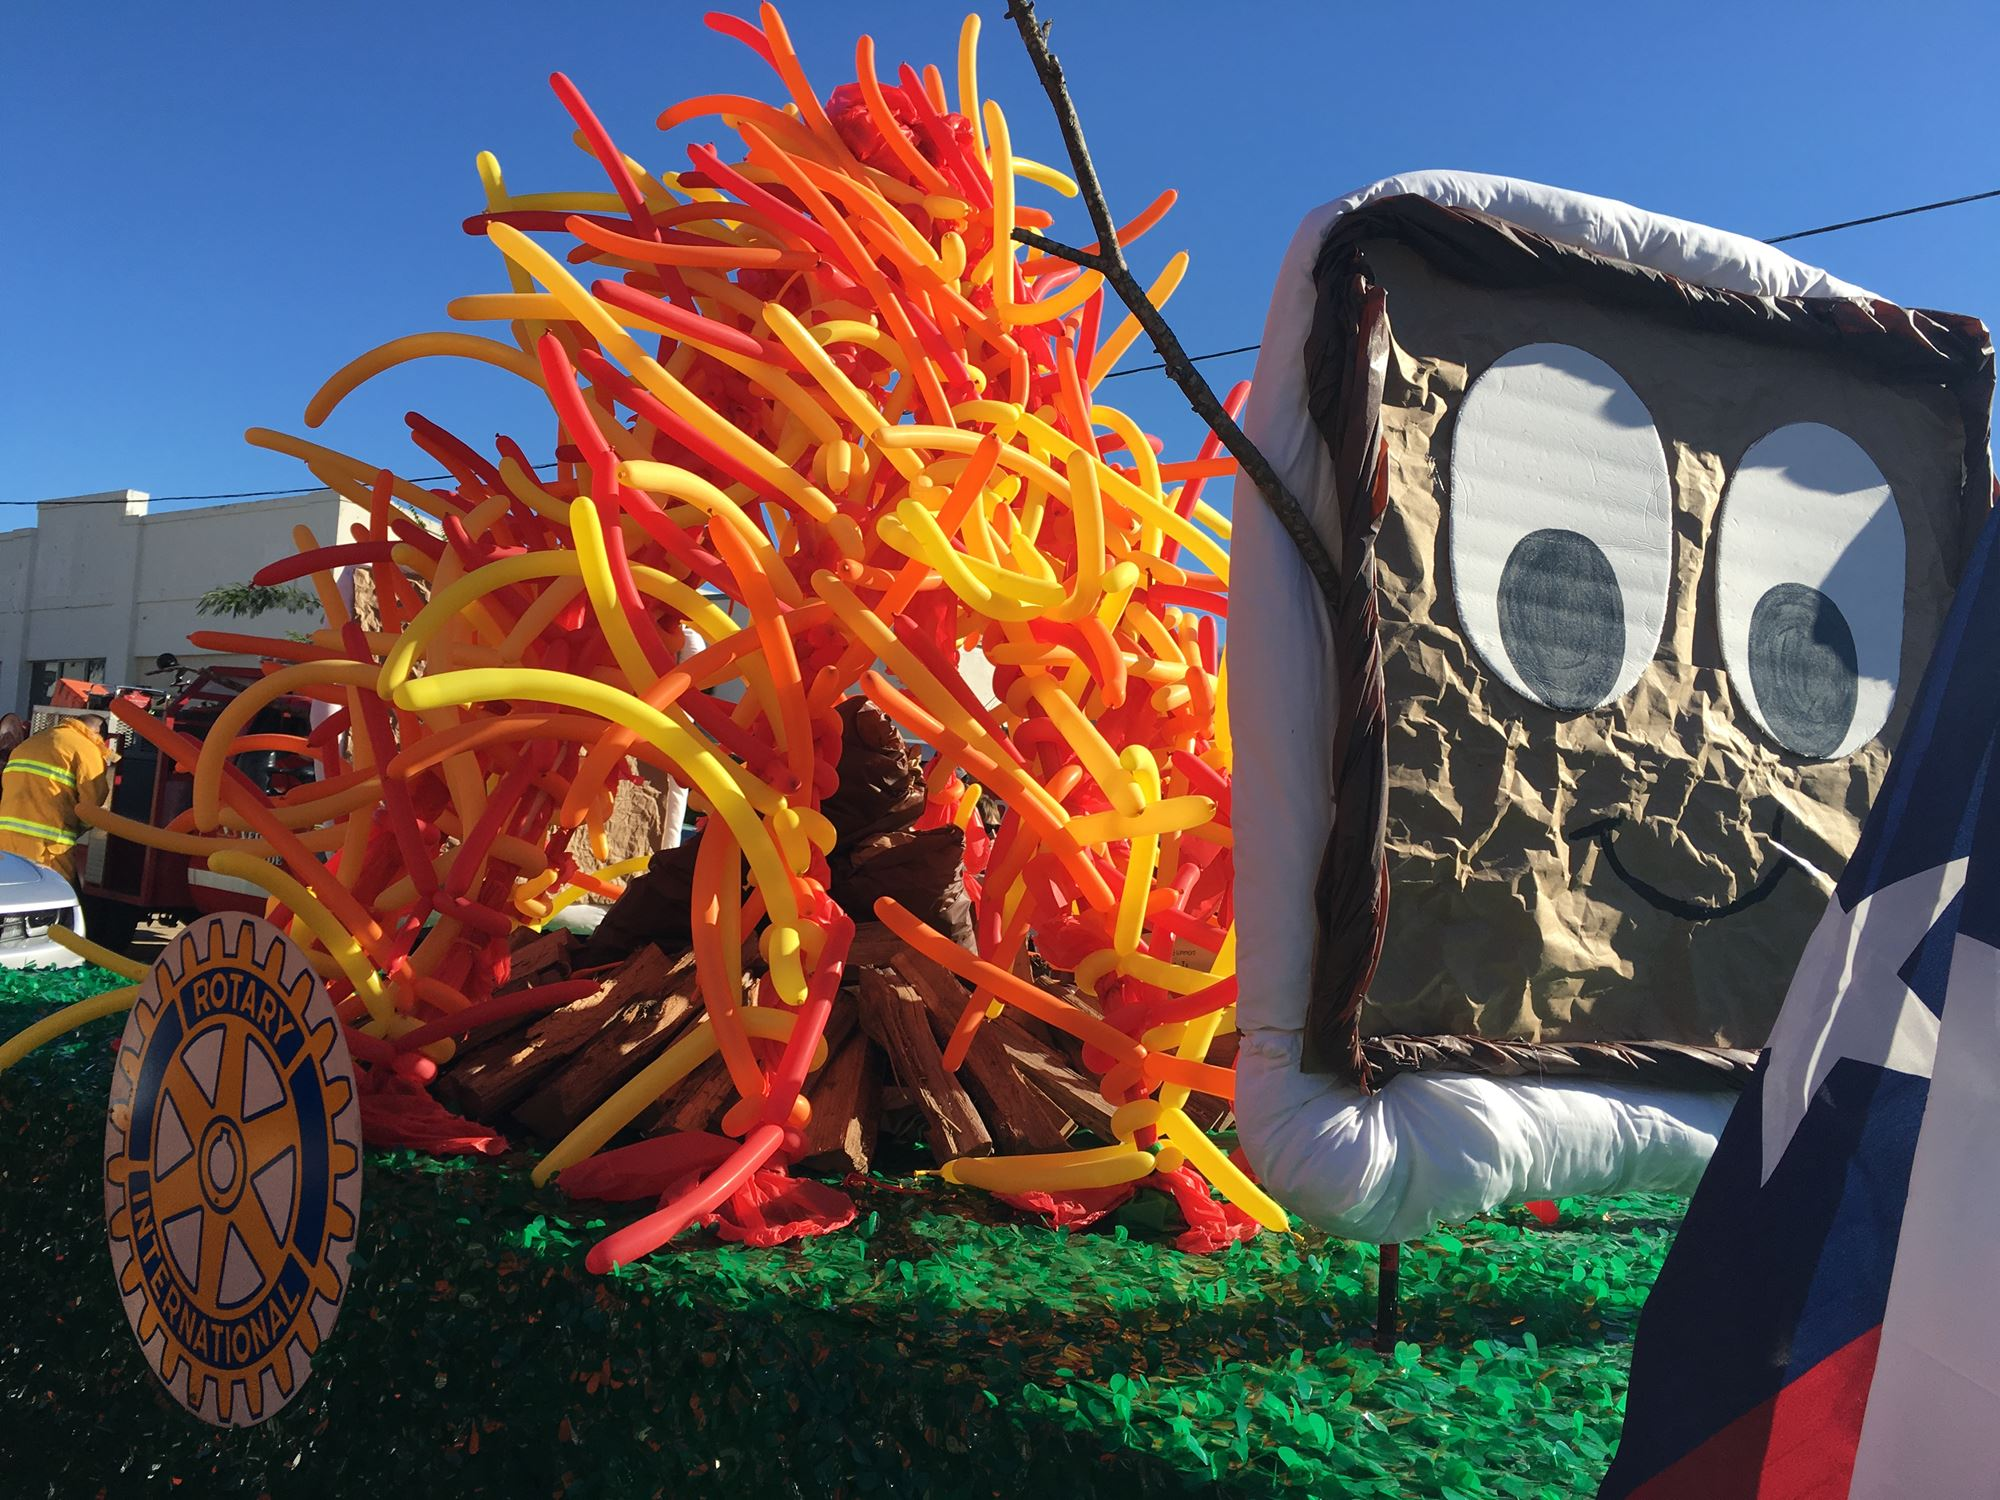 Hot Pepper Festival Parade Application